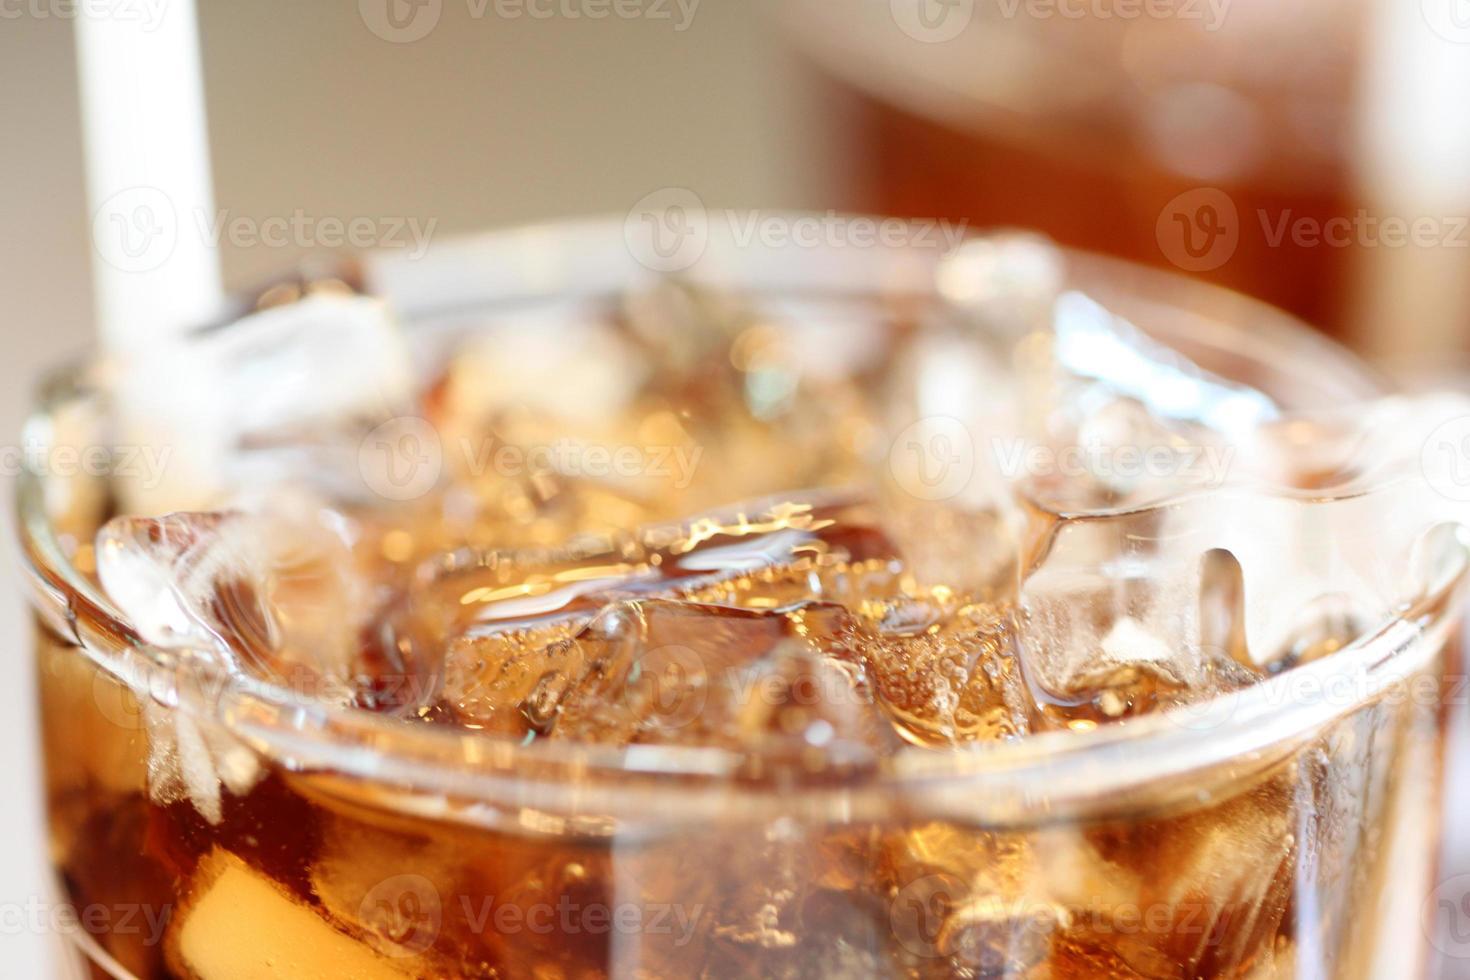 is cola dricker i glas. foto